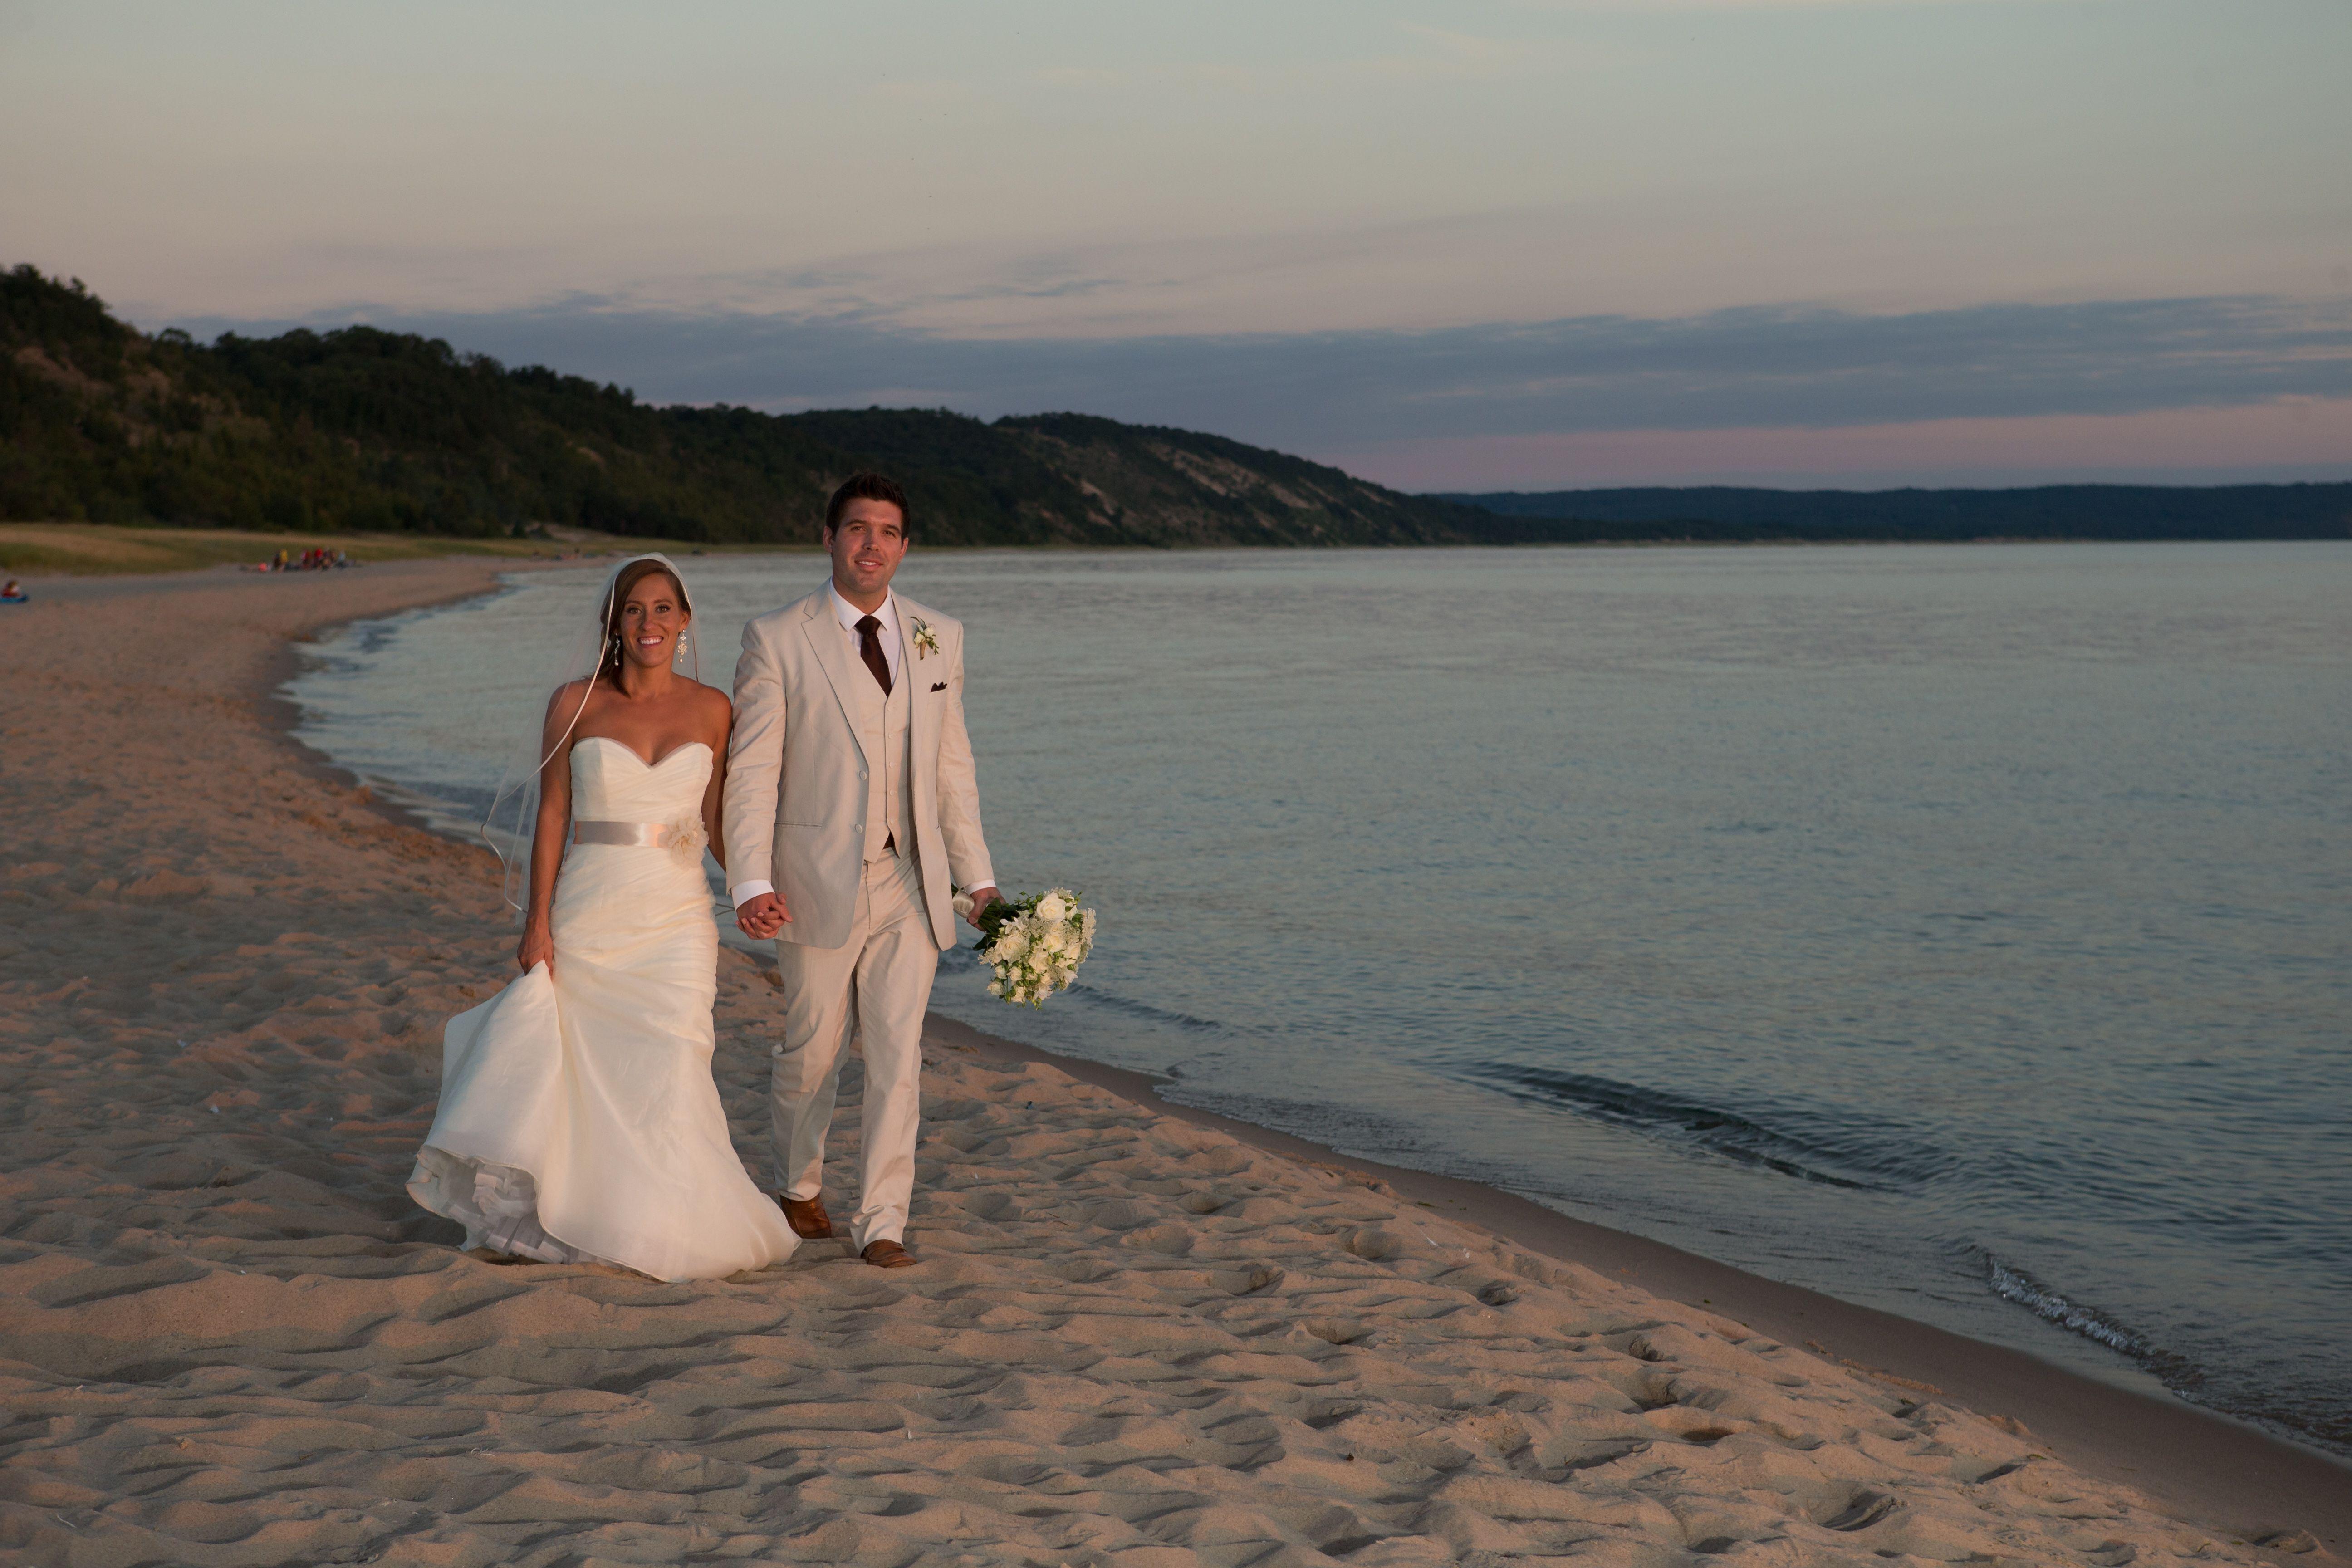 beach wedding south west uk%0A Point Judith Lighthouse  Rhode Island  Caster Creations Photography   My  Rhode Island beach wedding   Pinterest   Rhode island  Wedding and Wedd u